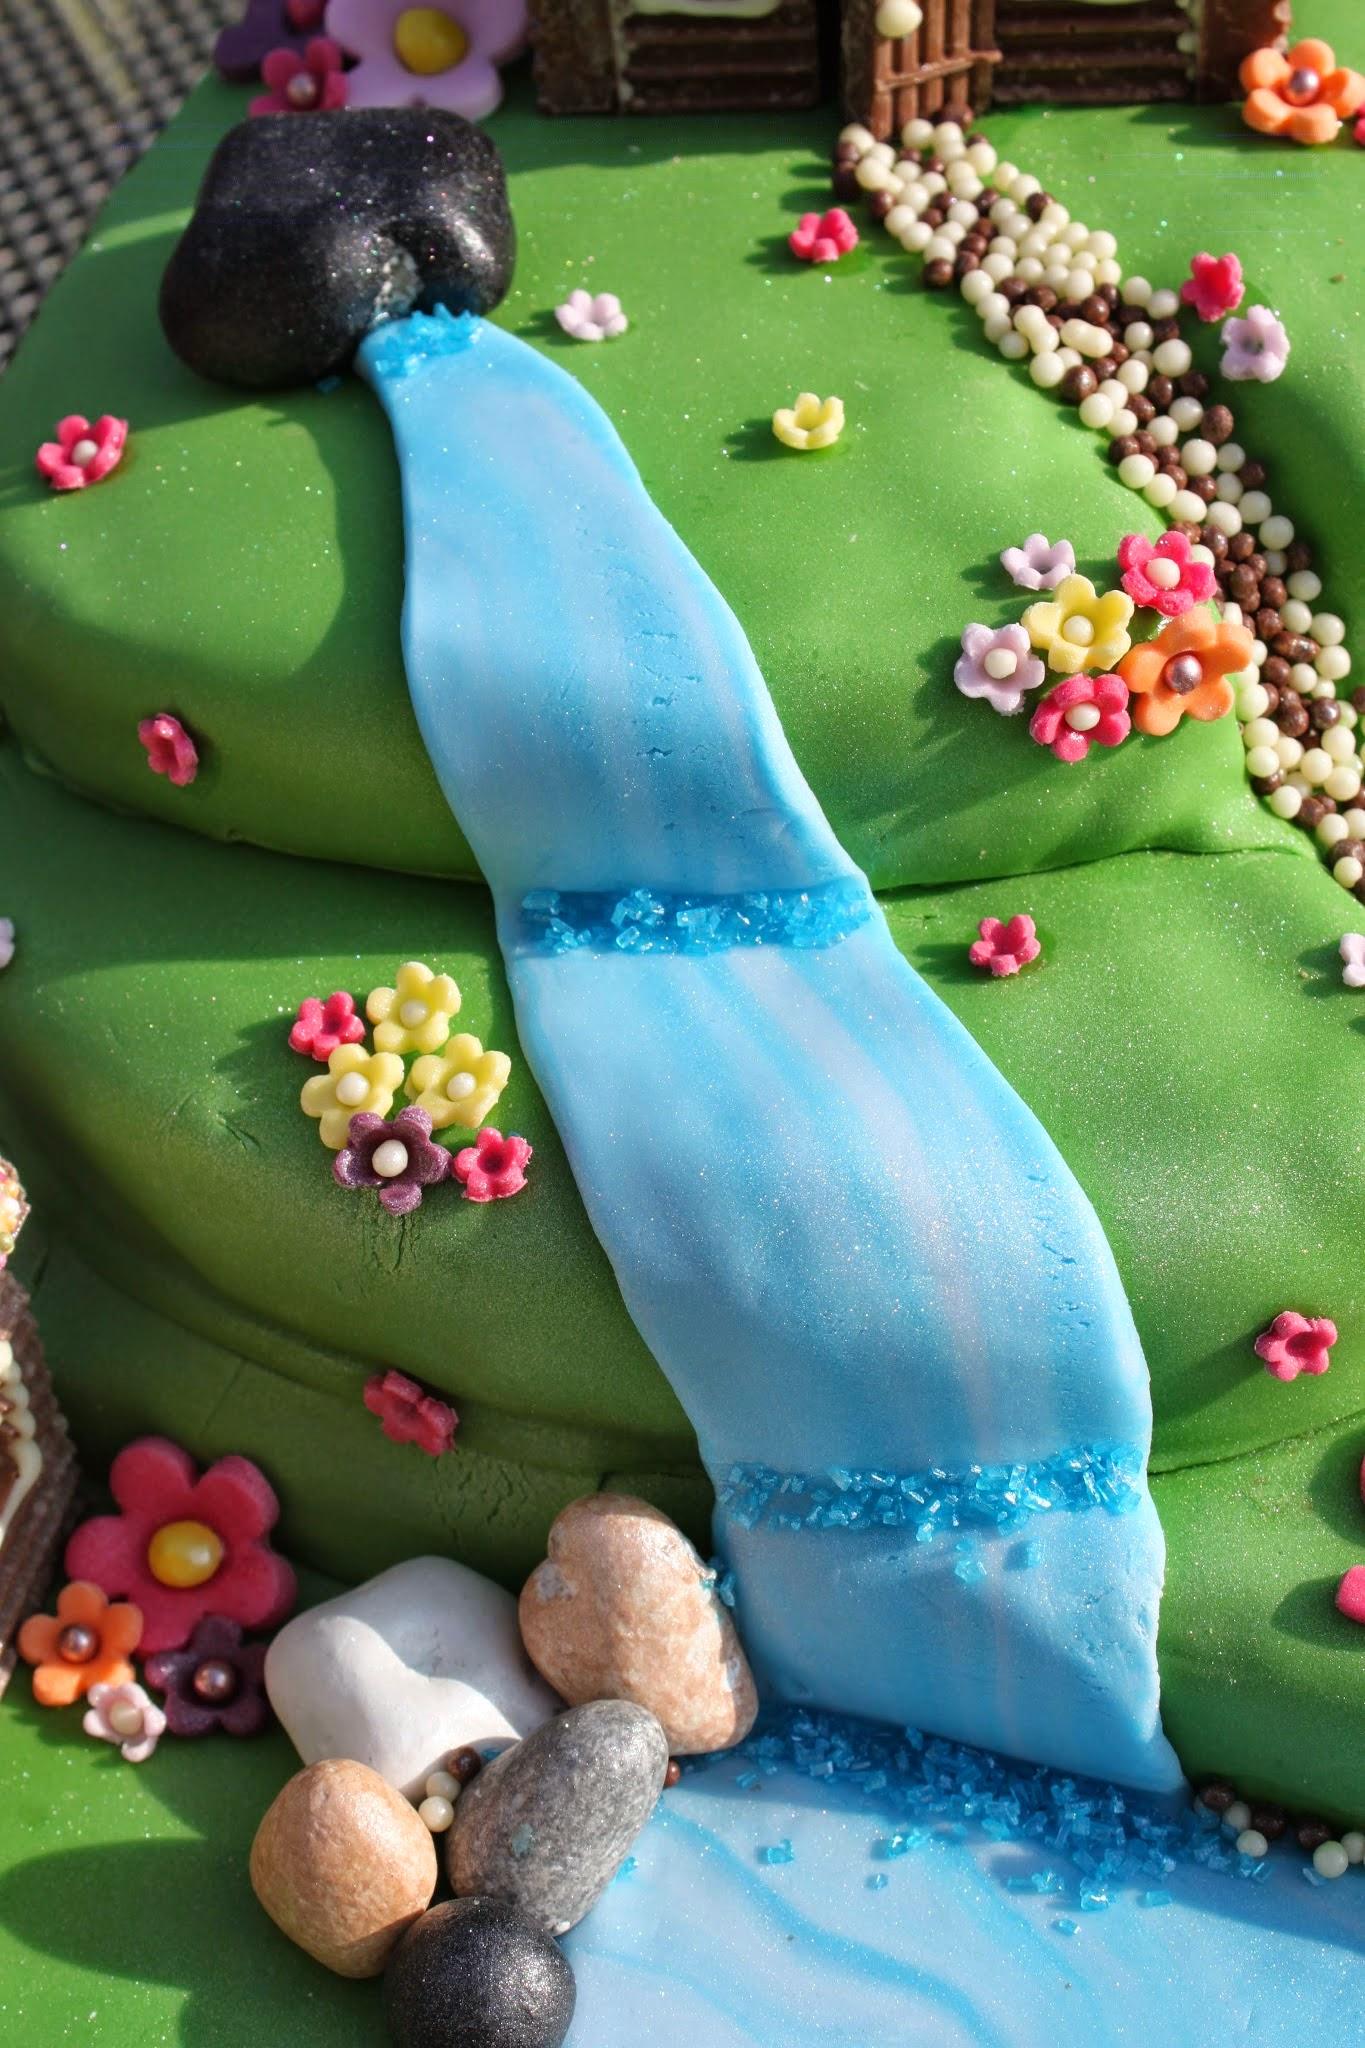 cake, alpine village, chocolate, chocolate house